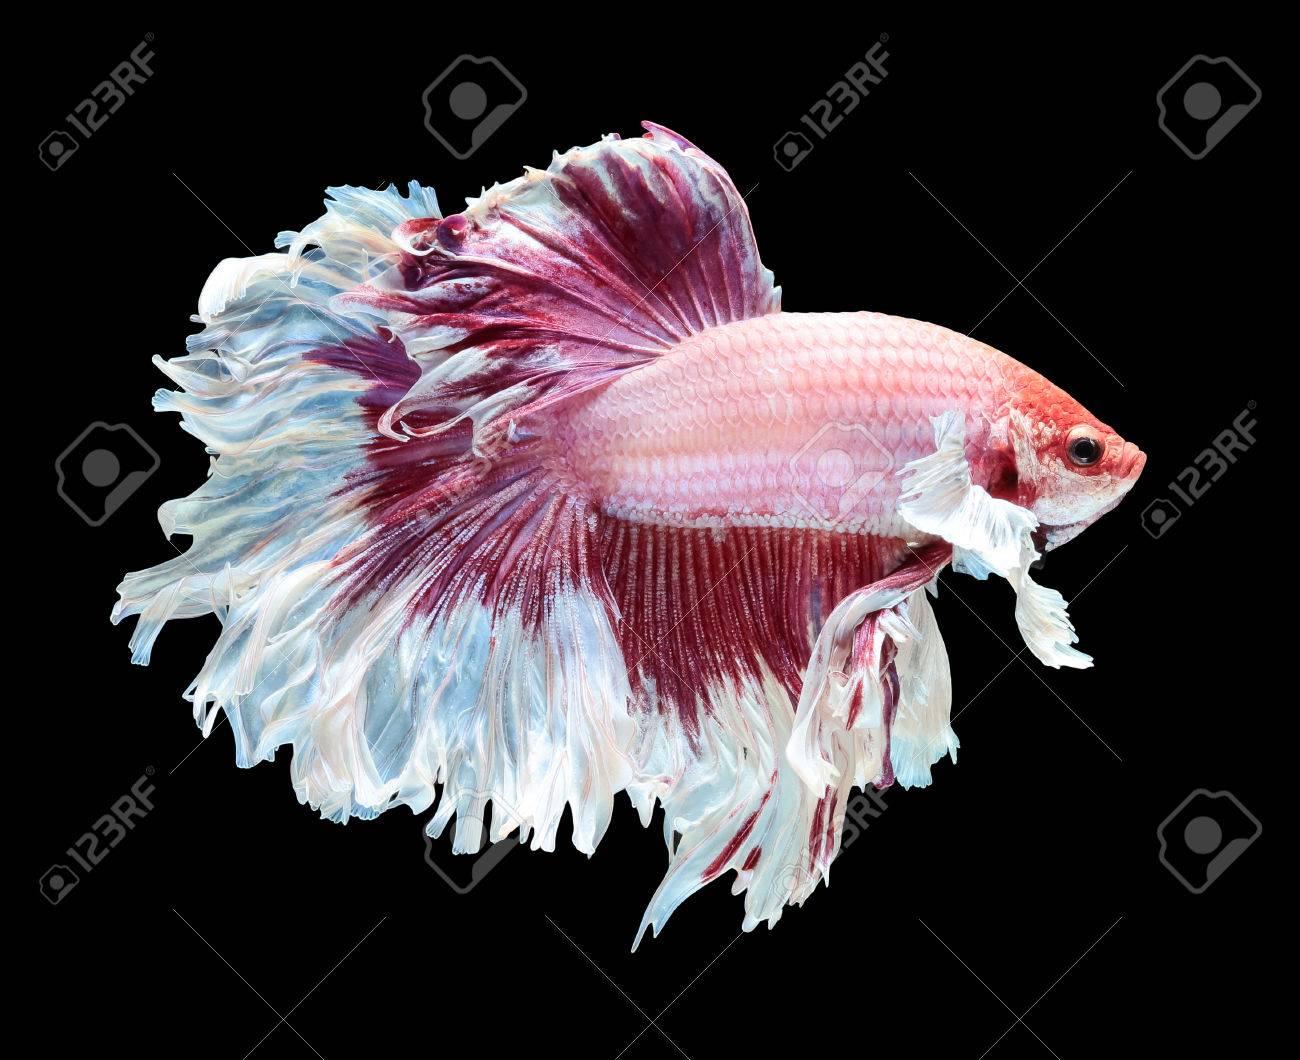 Betta fish, siamese fighting fish, betta splendens (Dumbo halfmoon